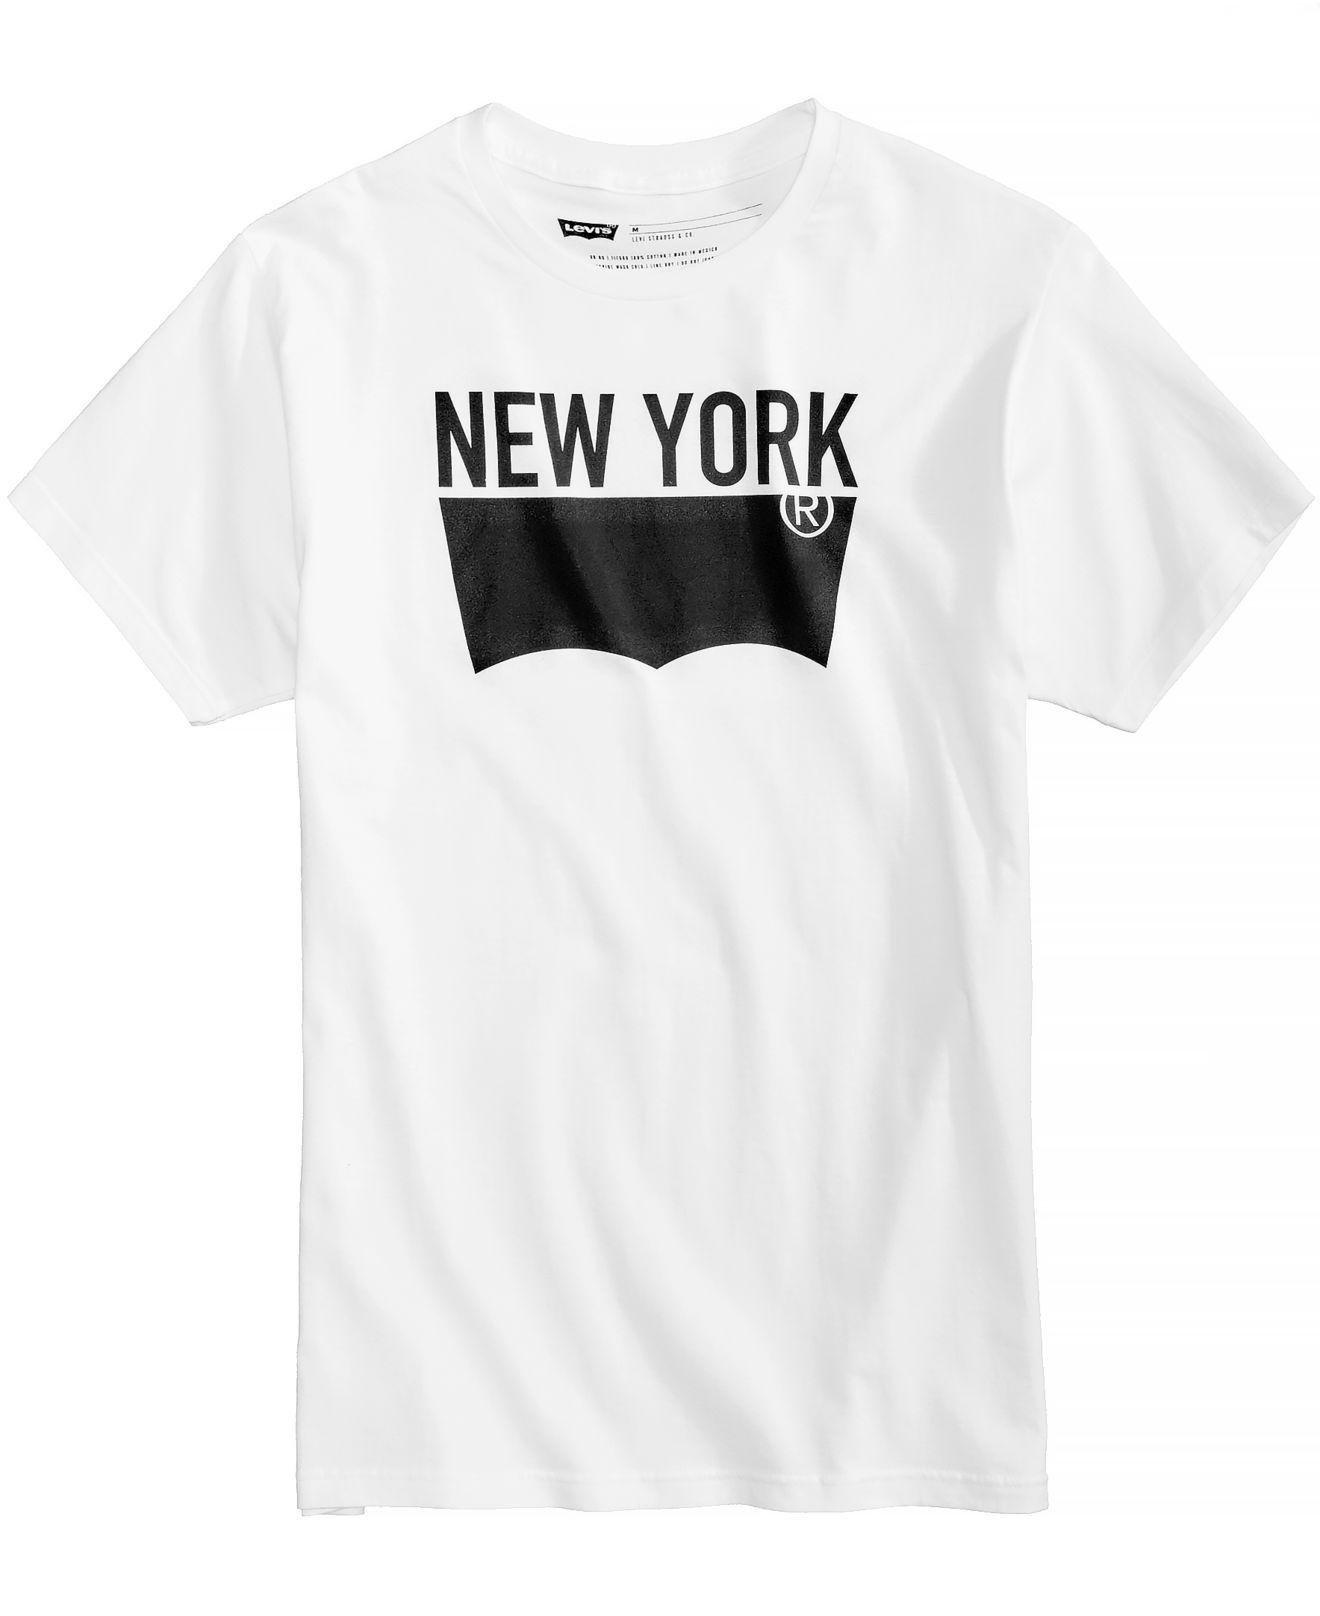 Print Logo On Shirt Nyc Best Photo Shirt Guerillafx